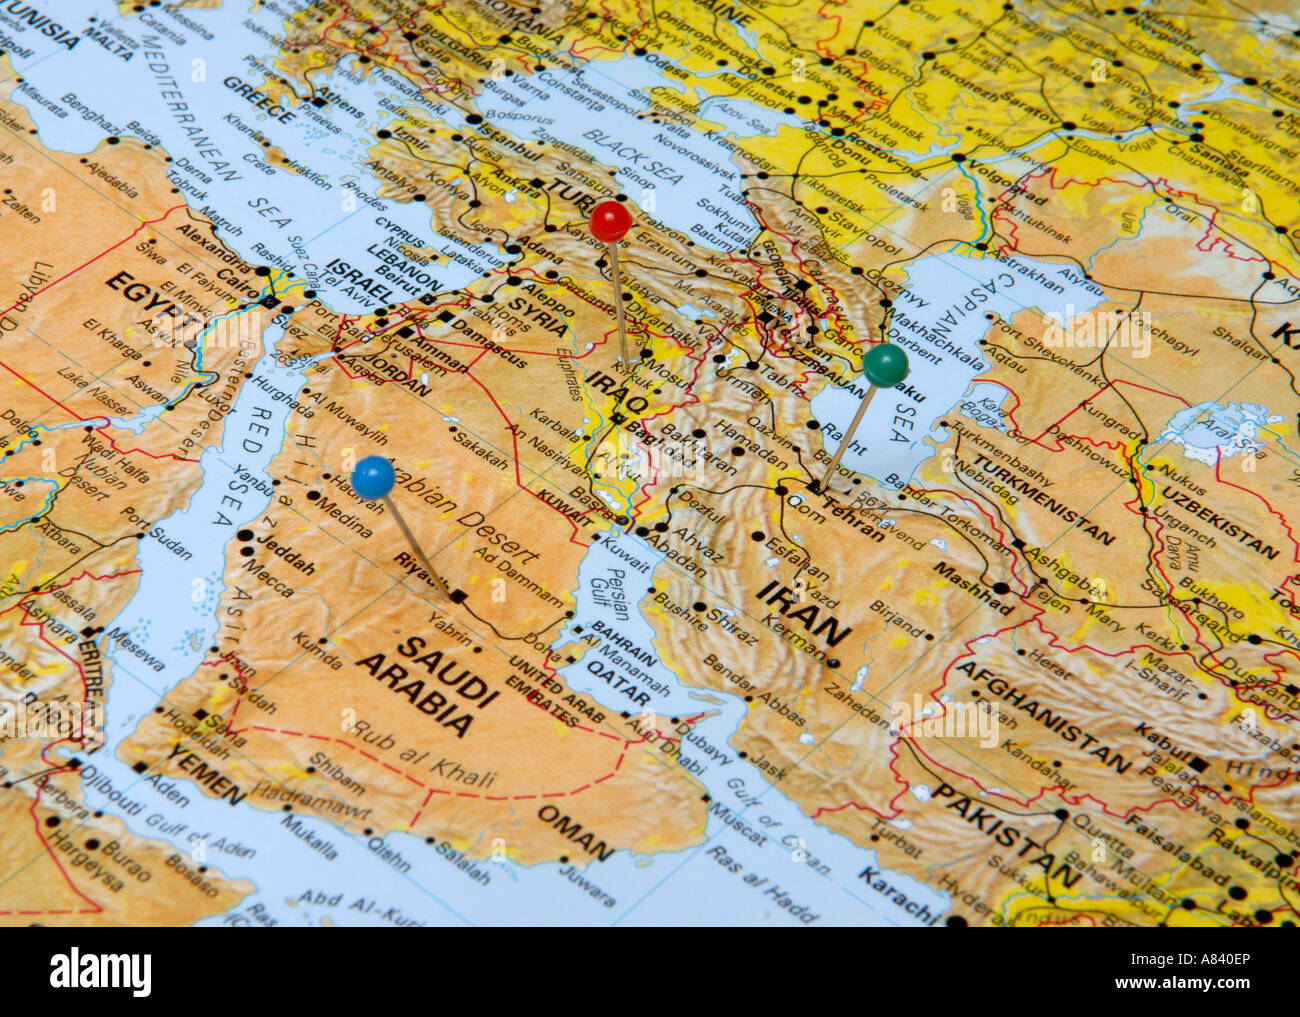 Iraq Iran Middle East Stock Photo: 11979693 - Alamy Map Iraq Iran on yemen map, mesopotamia iraq map, syria map, greece map, oman map, al-asad iraq map, us military iraq map, china map, khorsabad iraq map, jordan map, nimrud iraq map, tehran iraq map, lalish iraq map, islamic state iraq map, muqdadiyah iraq map, kuwait map, india map, raqqa iraq map, sumeria iraq map, world map,